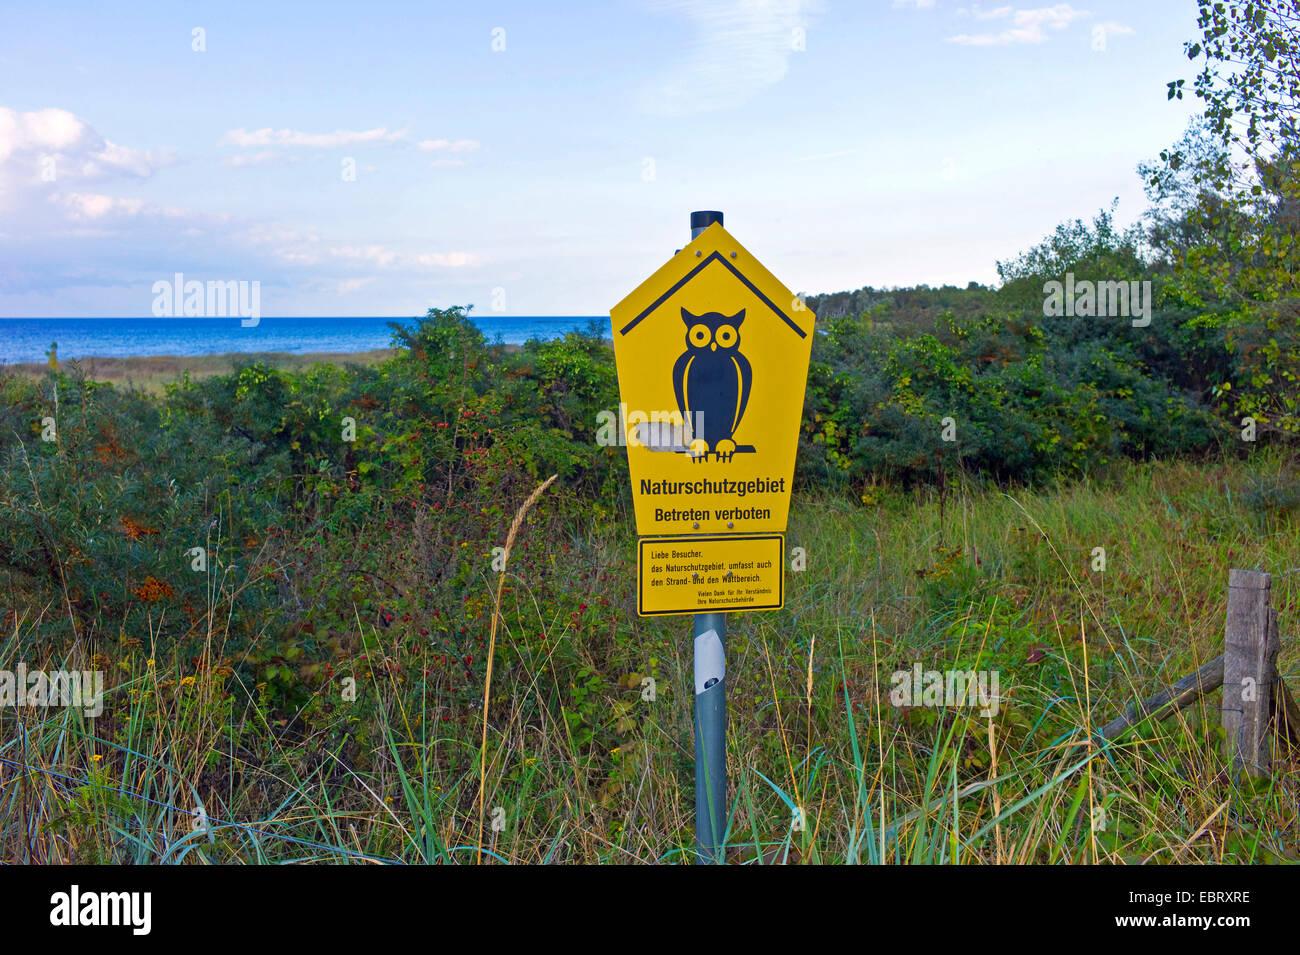 nature reserve sign at Weisse Wiek, Germany, Mecklenburg-Western Pomerania, Boltenhagen Tarnewitz - Stock Image